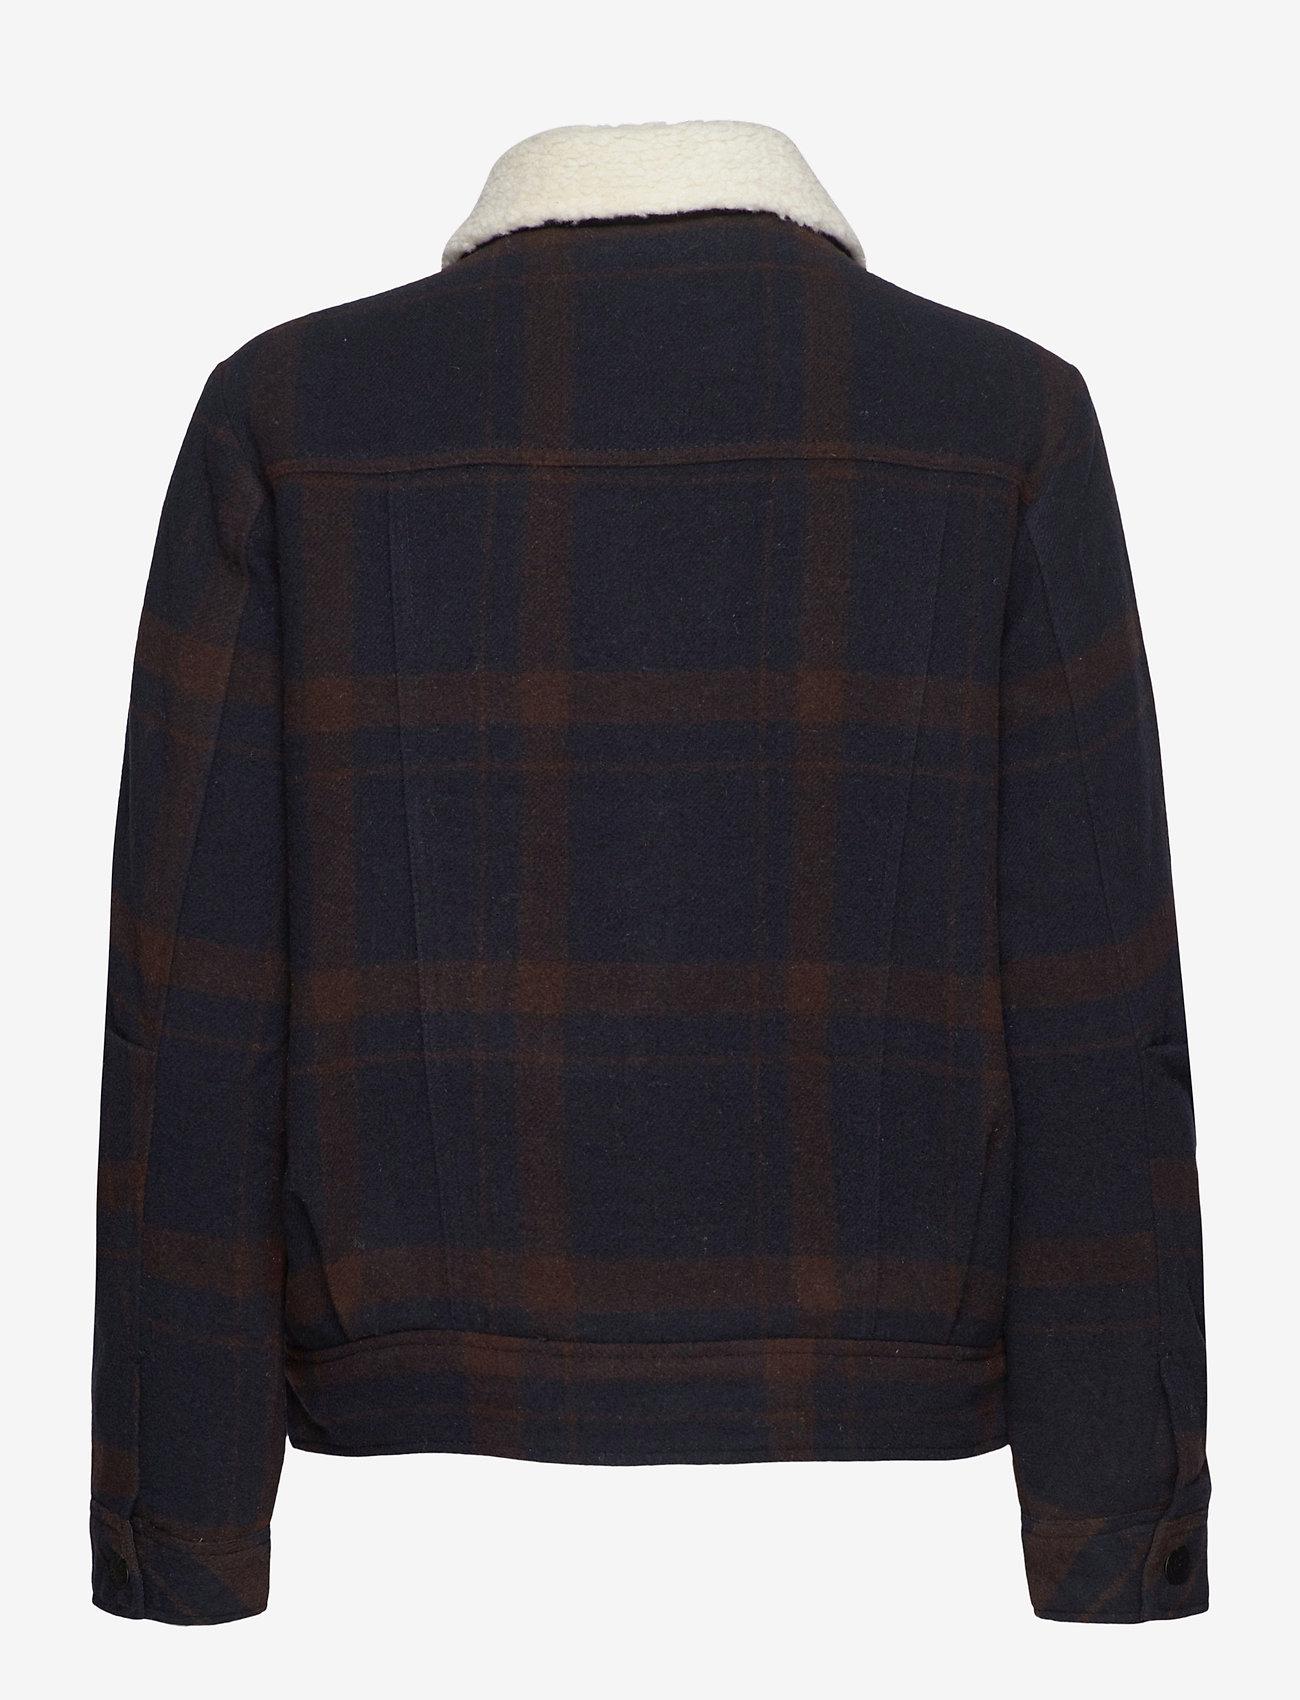 Lee Jeans - WOOL CHECK SHERPA JK - wool jackets - winter brown - 1